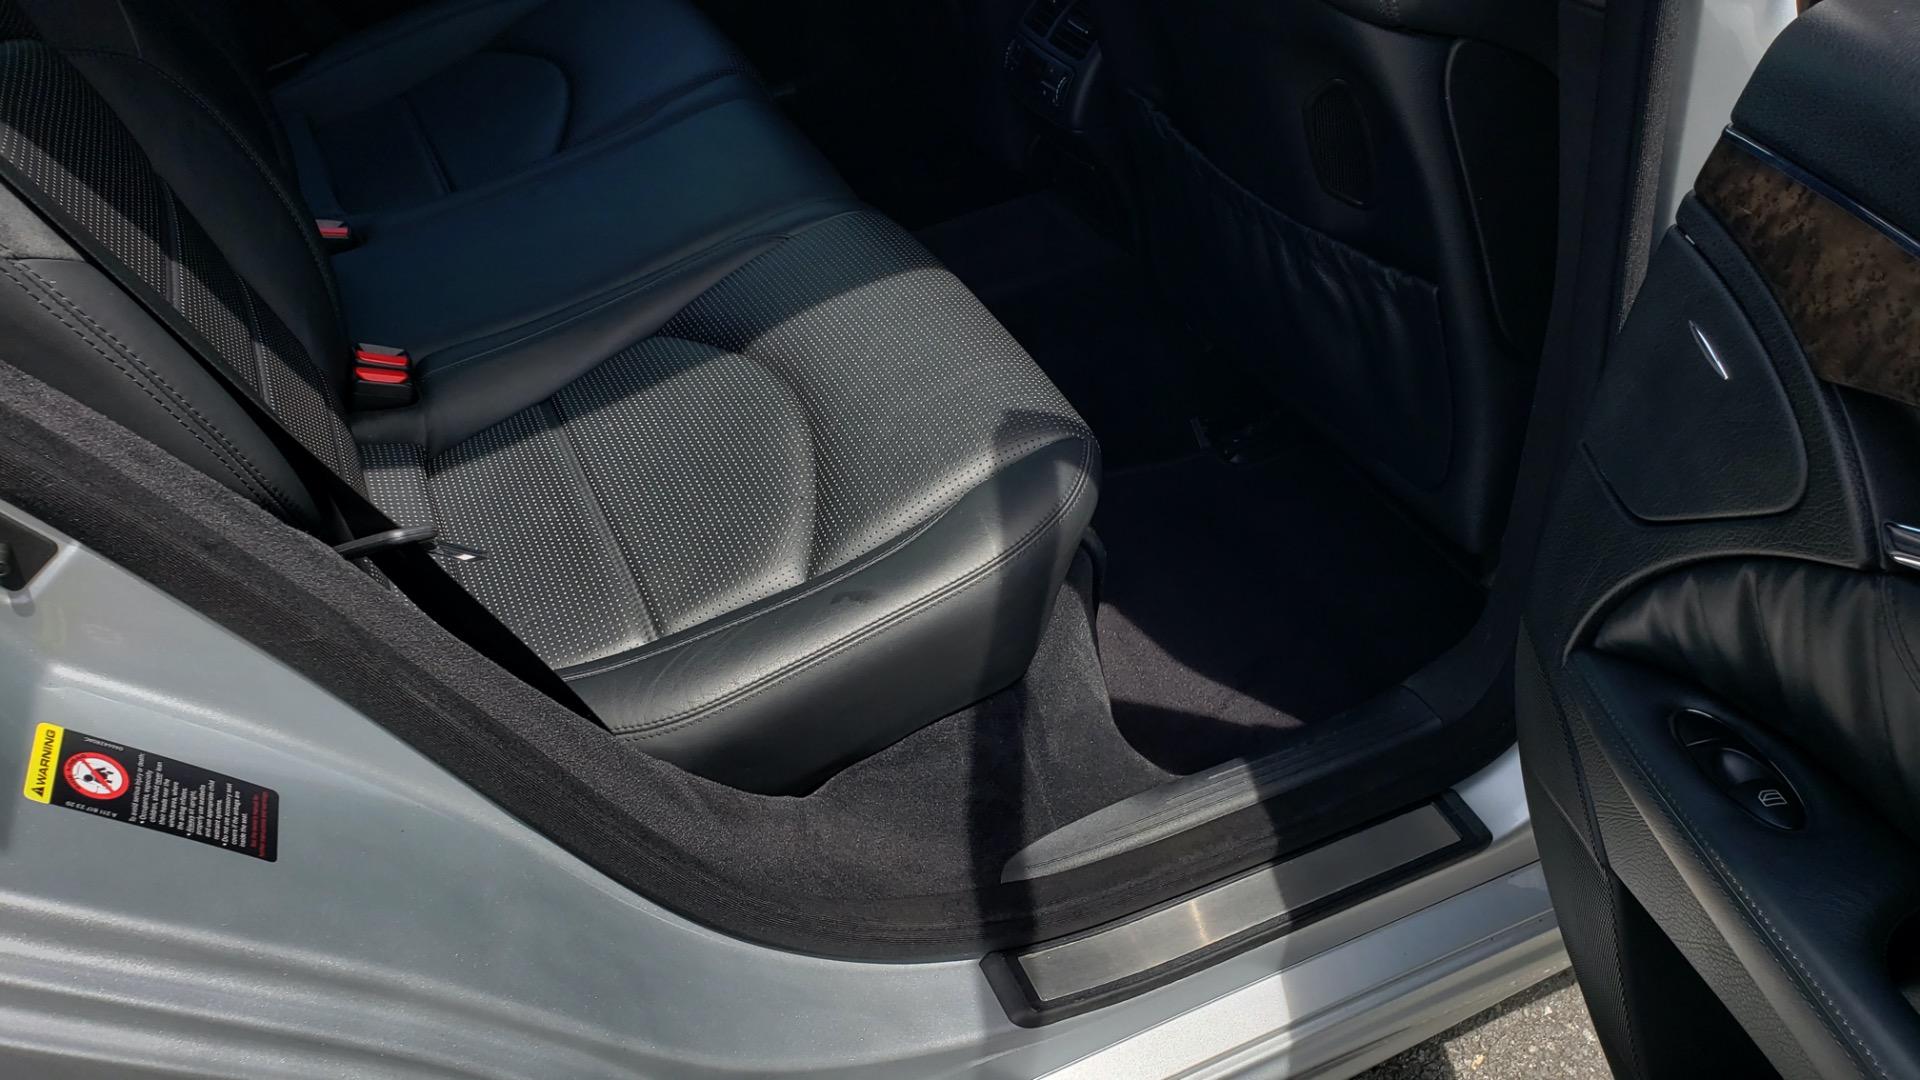 Used 2007 Mercedes-Benz E-Class E63 AMG WAGON / NAV / SUNROOF / HARMAN/KARDON for sale $29,000 at Formula Imports in Charlotte NC 28227 75